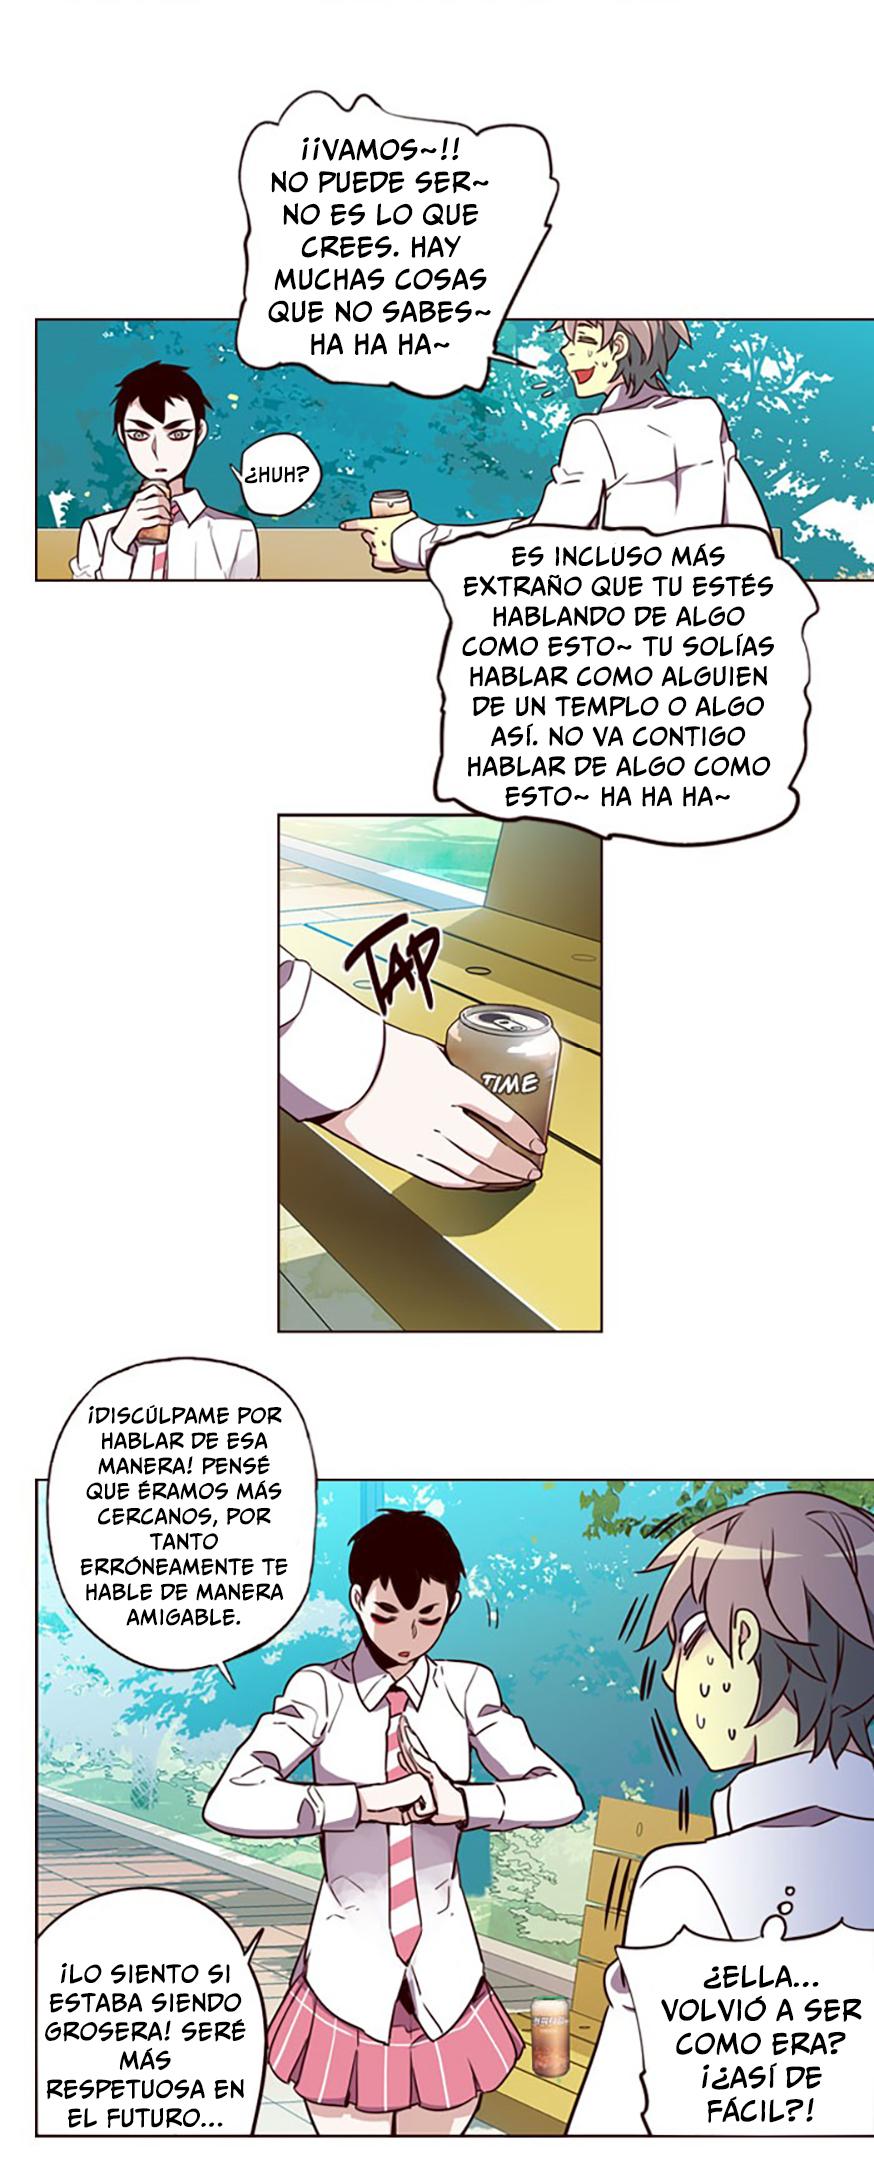 http://c5.ninemanga.com/es_manga/32/416/361799/0ed3c59f0da91202741eee9353f112d8.jpg Page 9